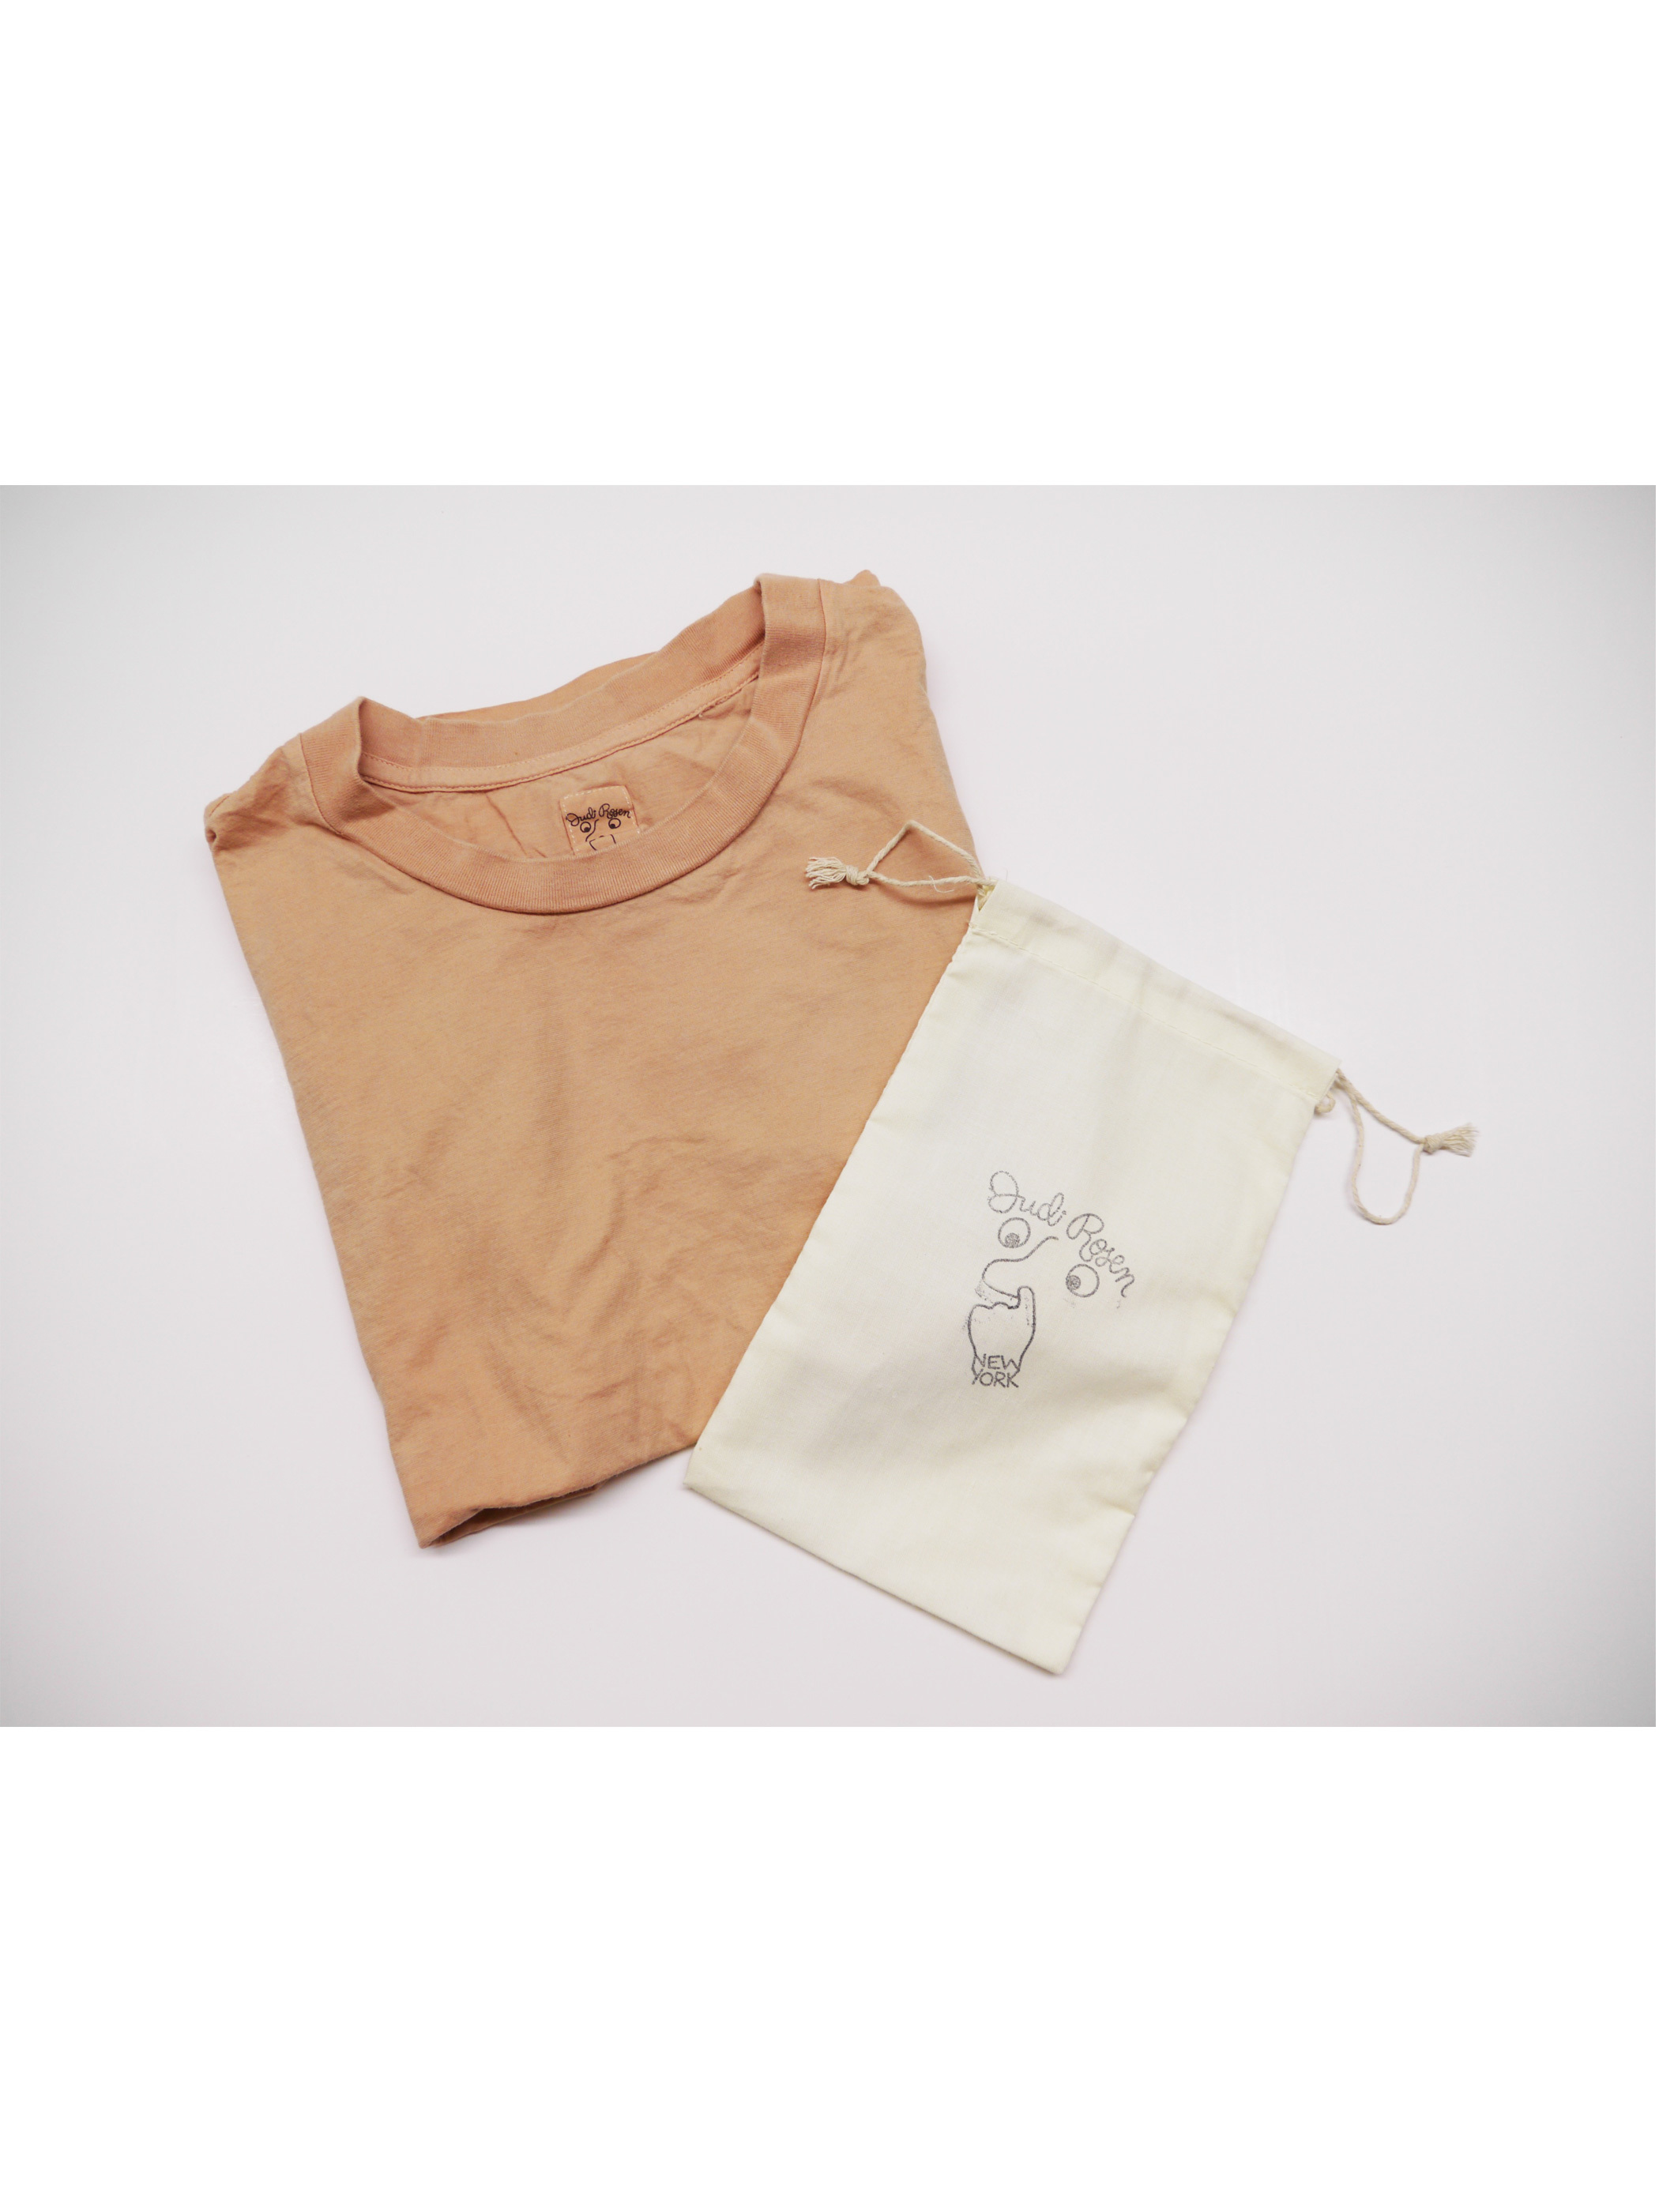 [Judi Rosen]Avocado Dye T-shirts